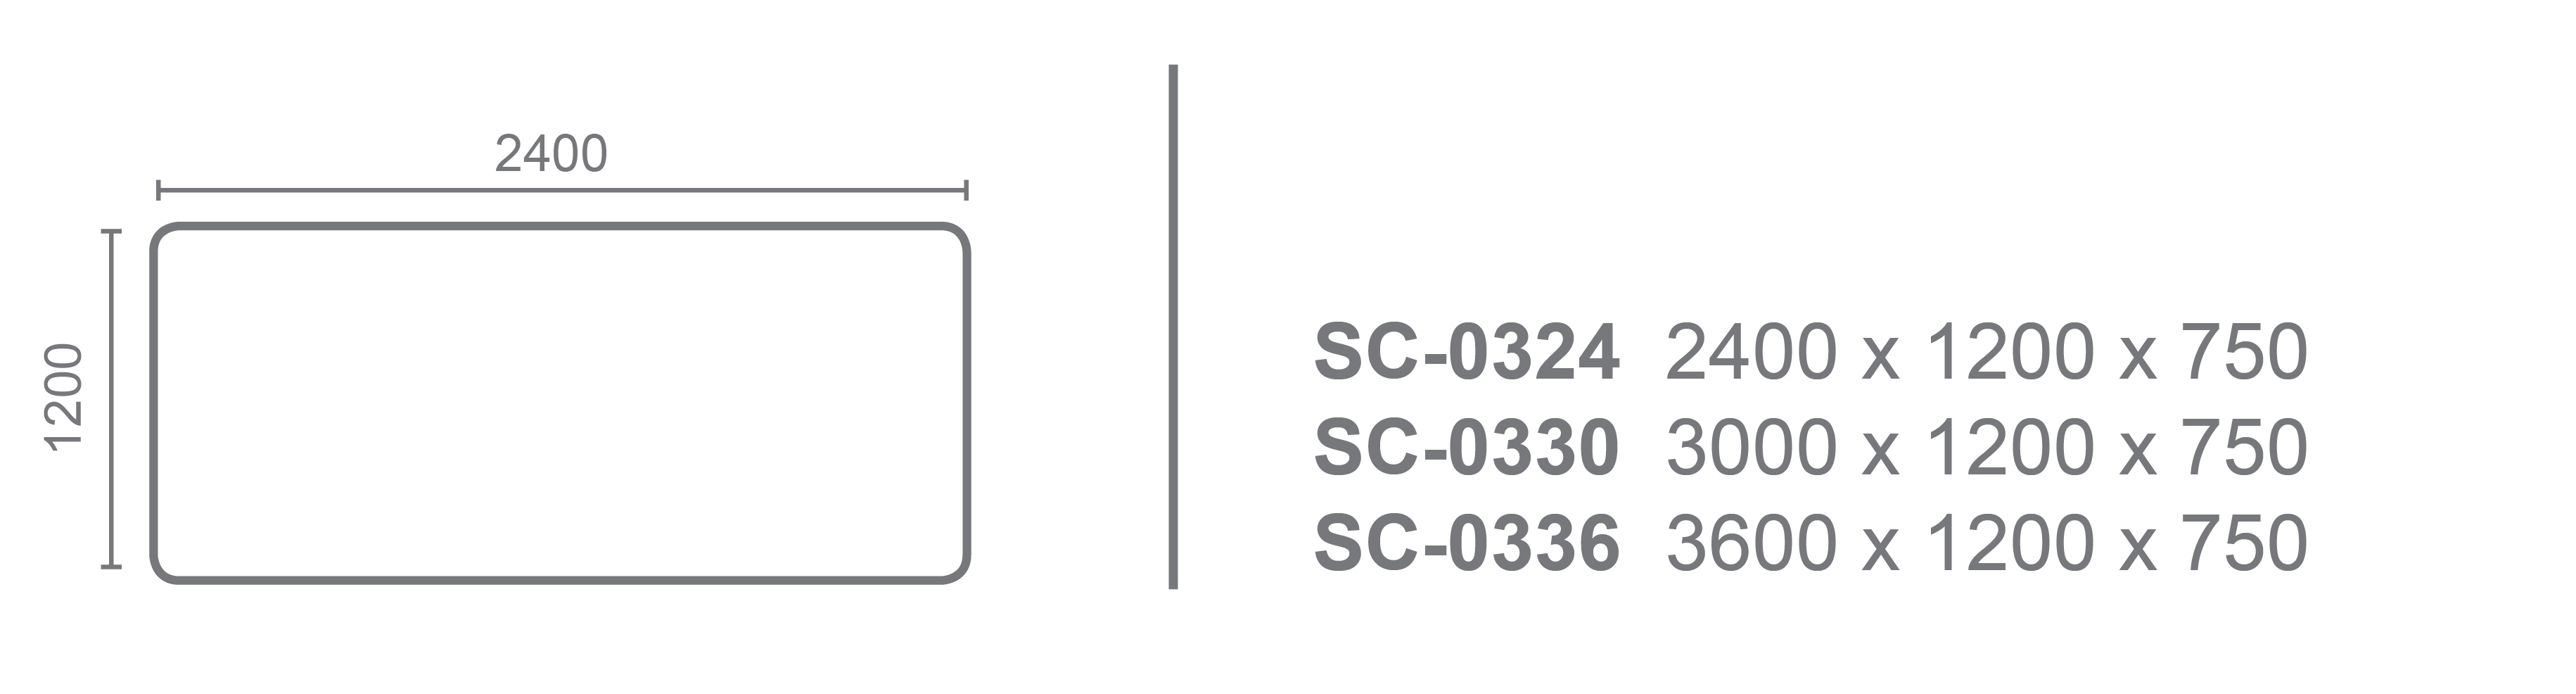 SC-0324